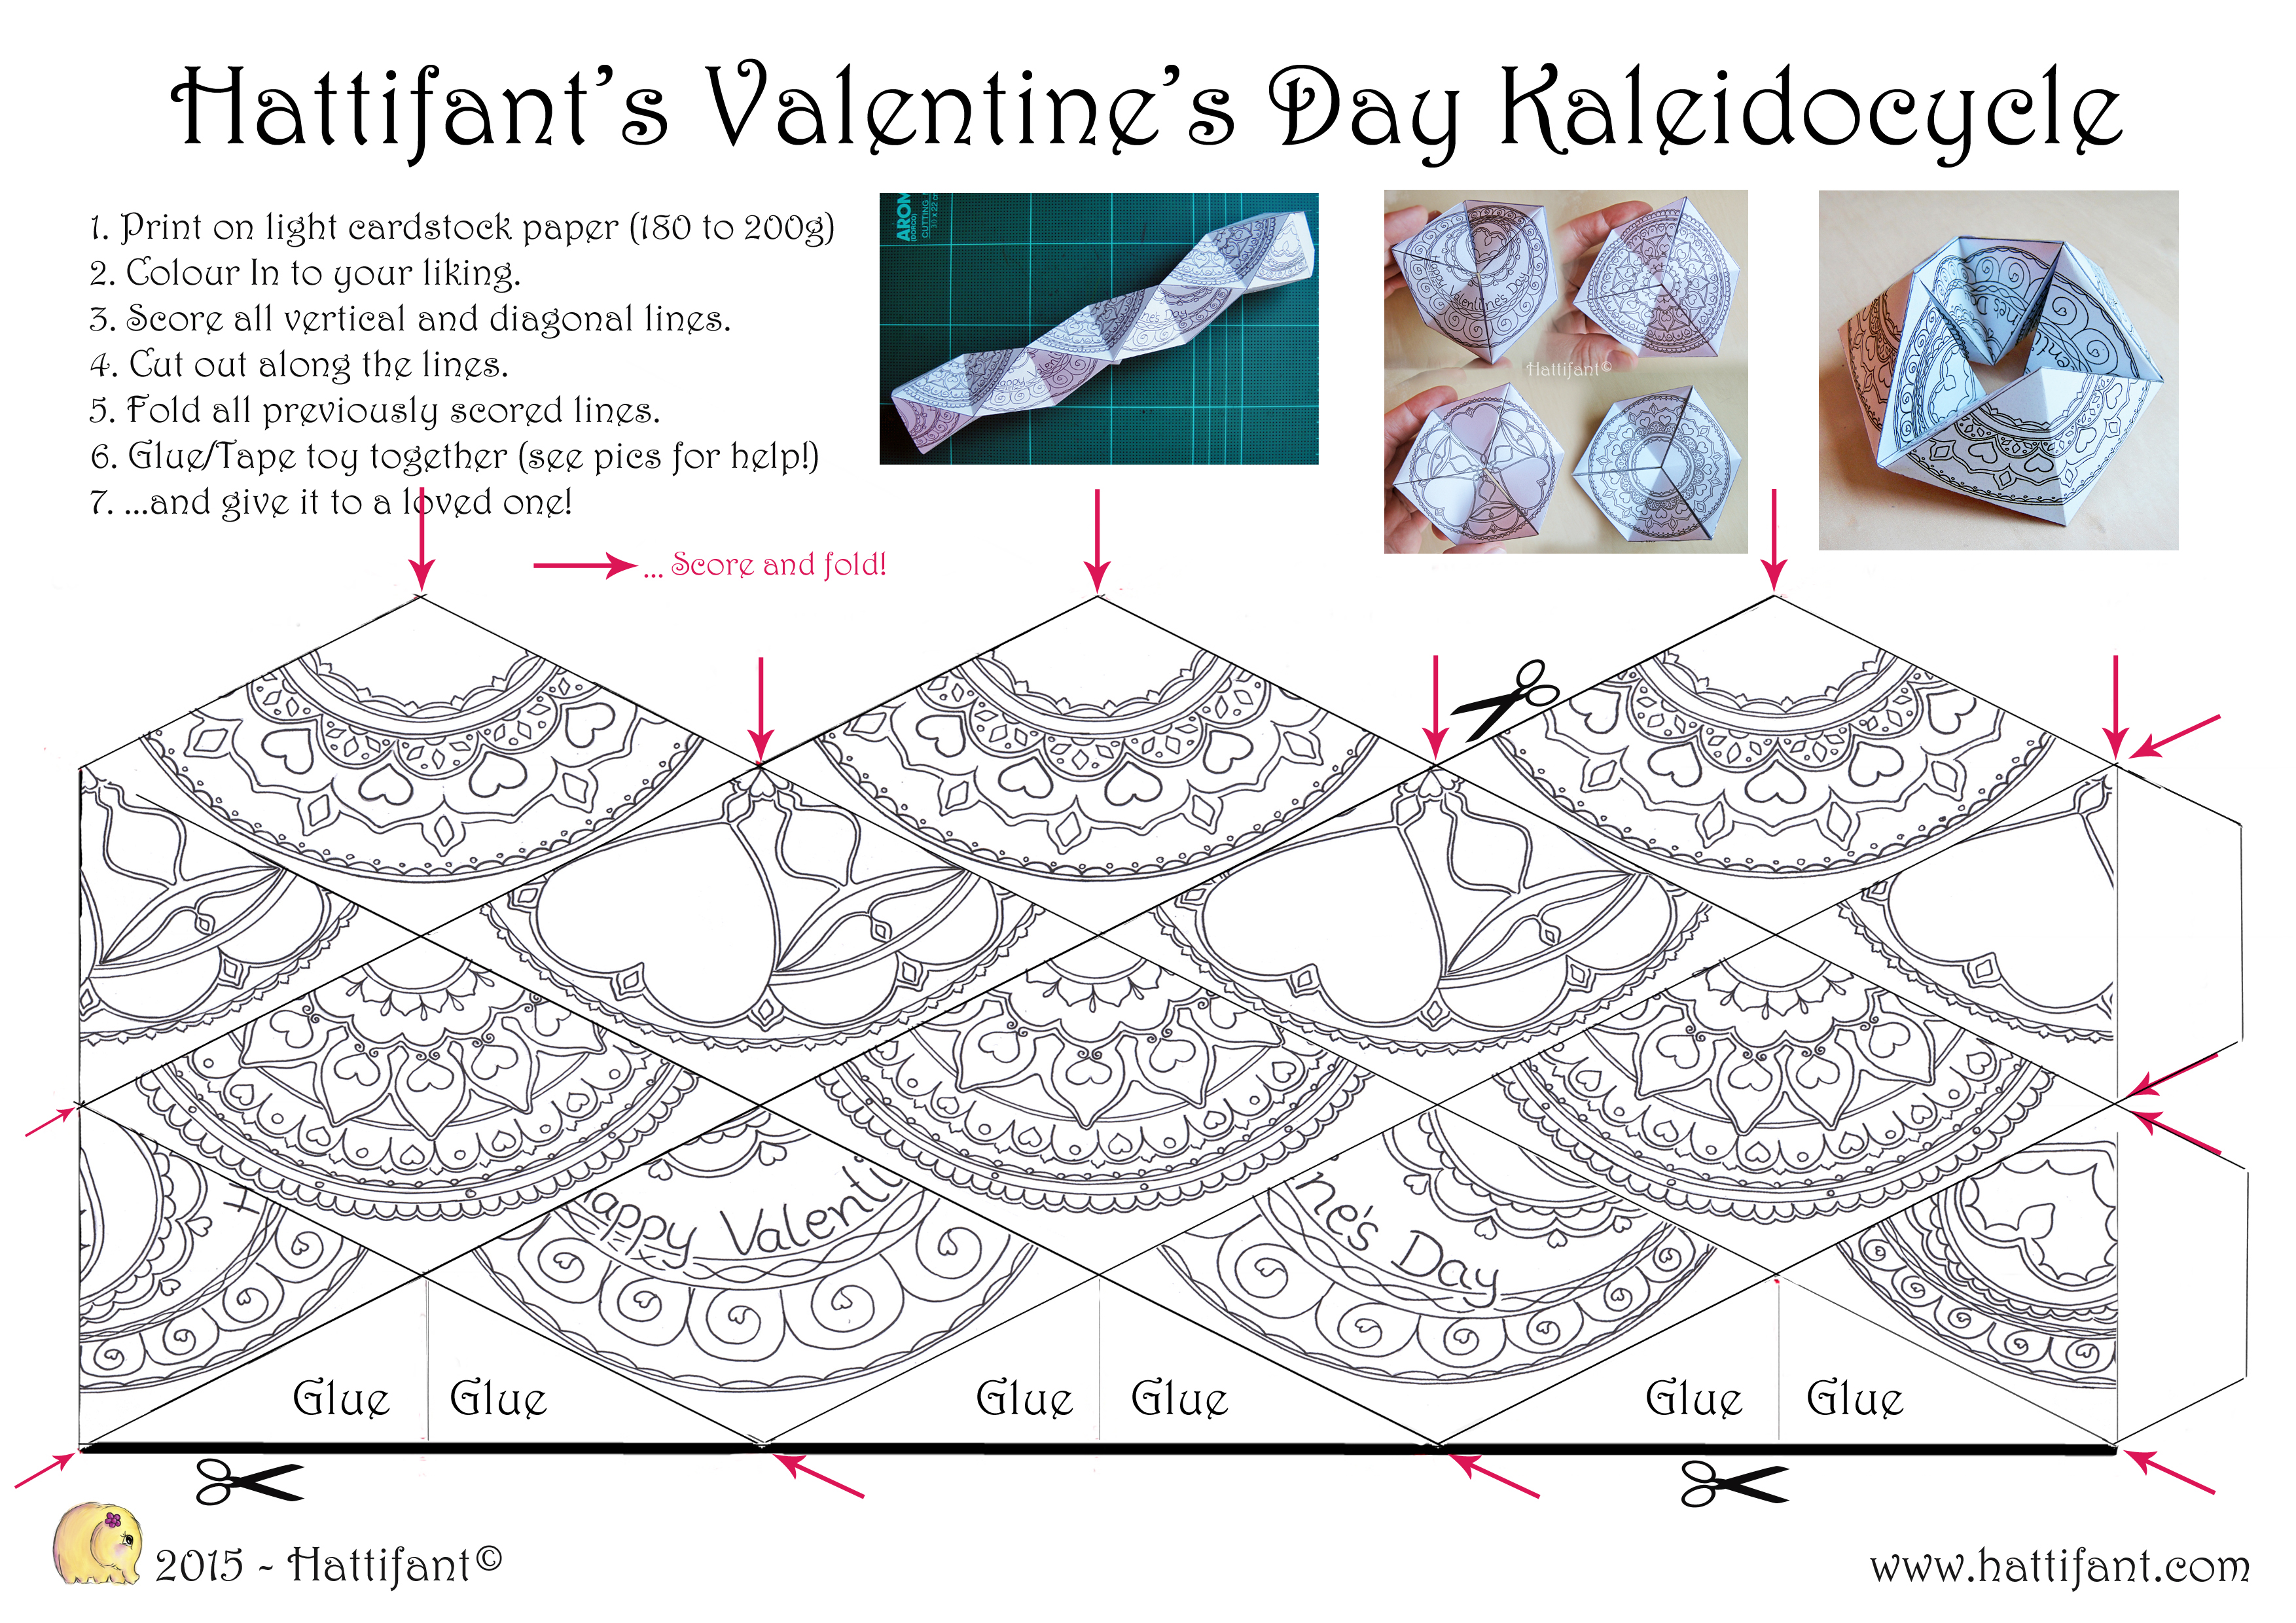 Kaleidocycle Valentinesday A4 Hattifant